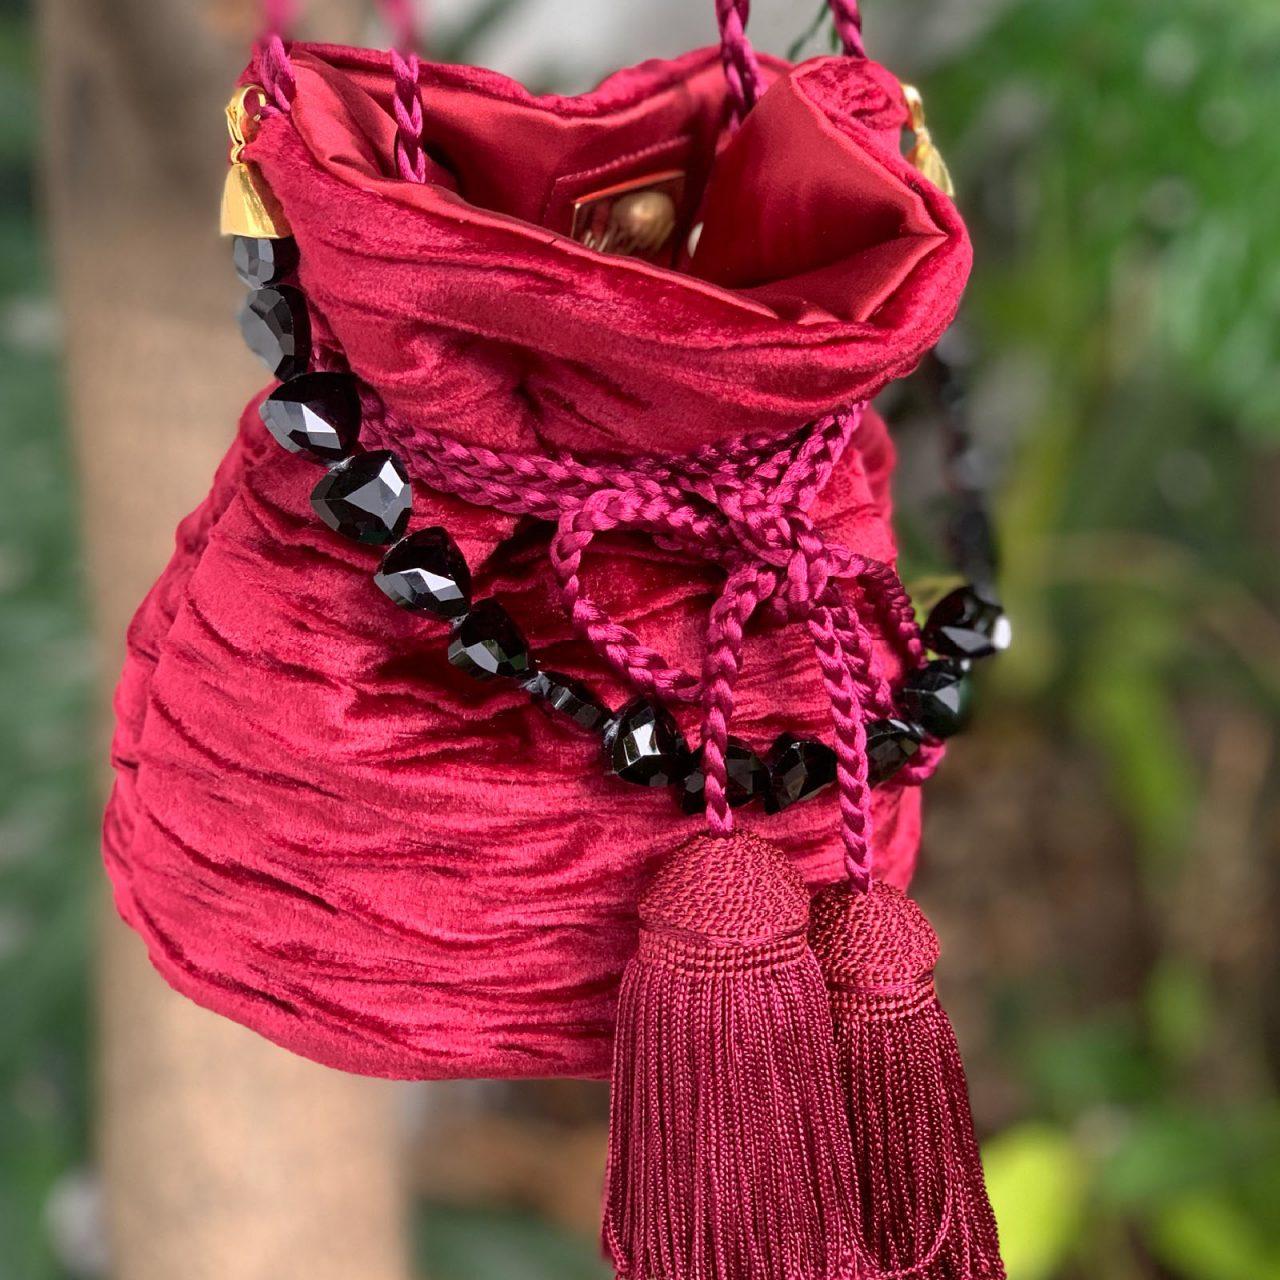 mochila luxo velvet pequeña cadena maytimeless en atizz